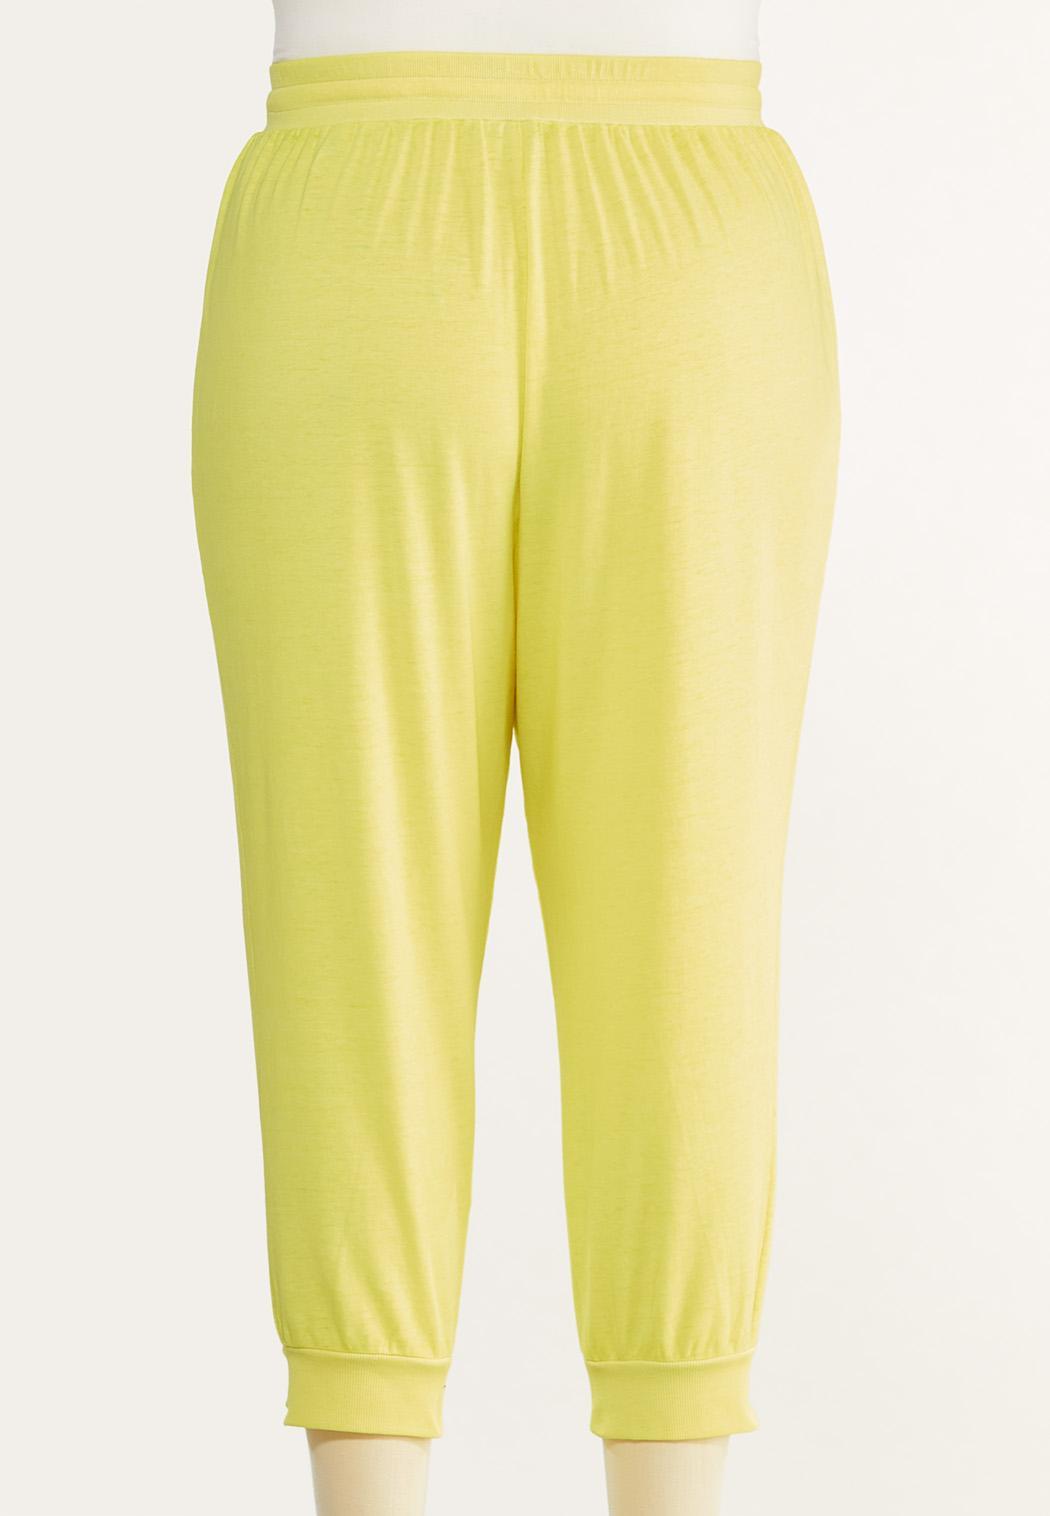 Plus Size Cropped Lemon Lime Joggers (Item #44548215)